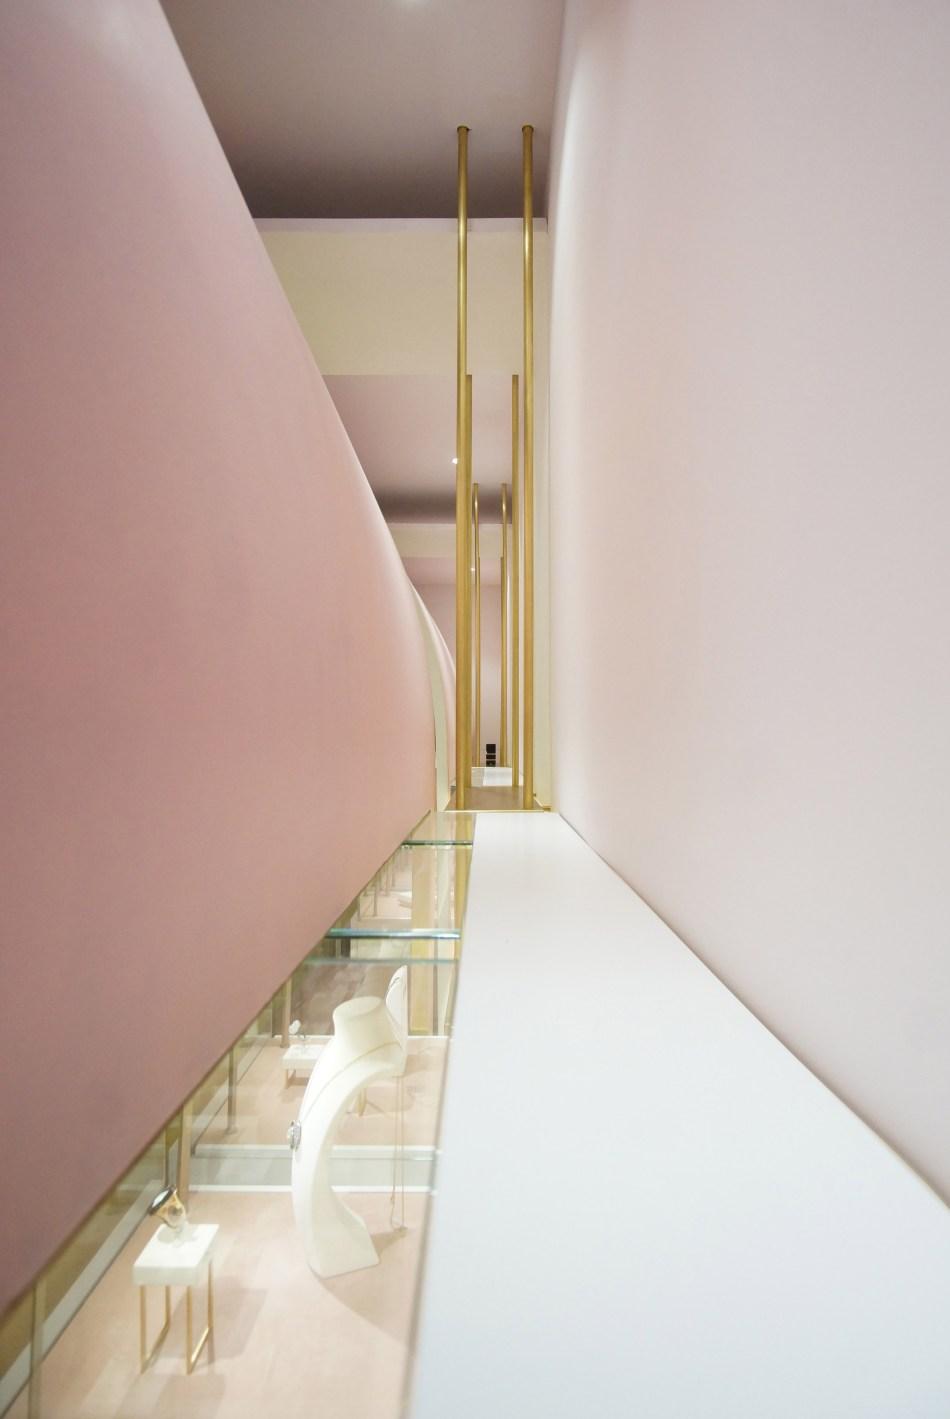 nuun-jewellery-shop-java-architectes-interiors-retail-paris-france_dezeen_2364_col_3